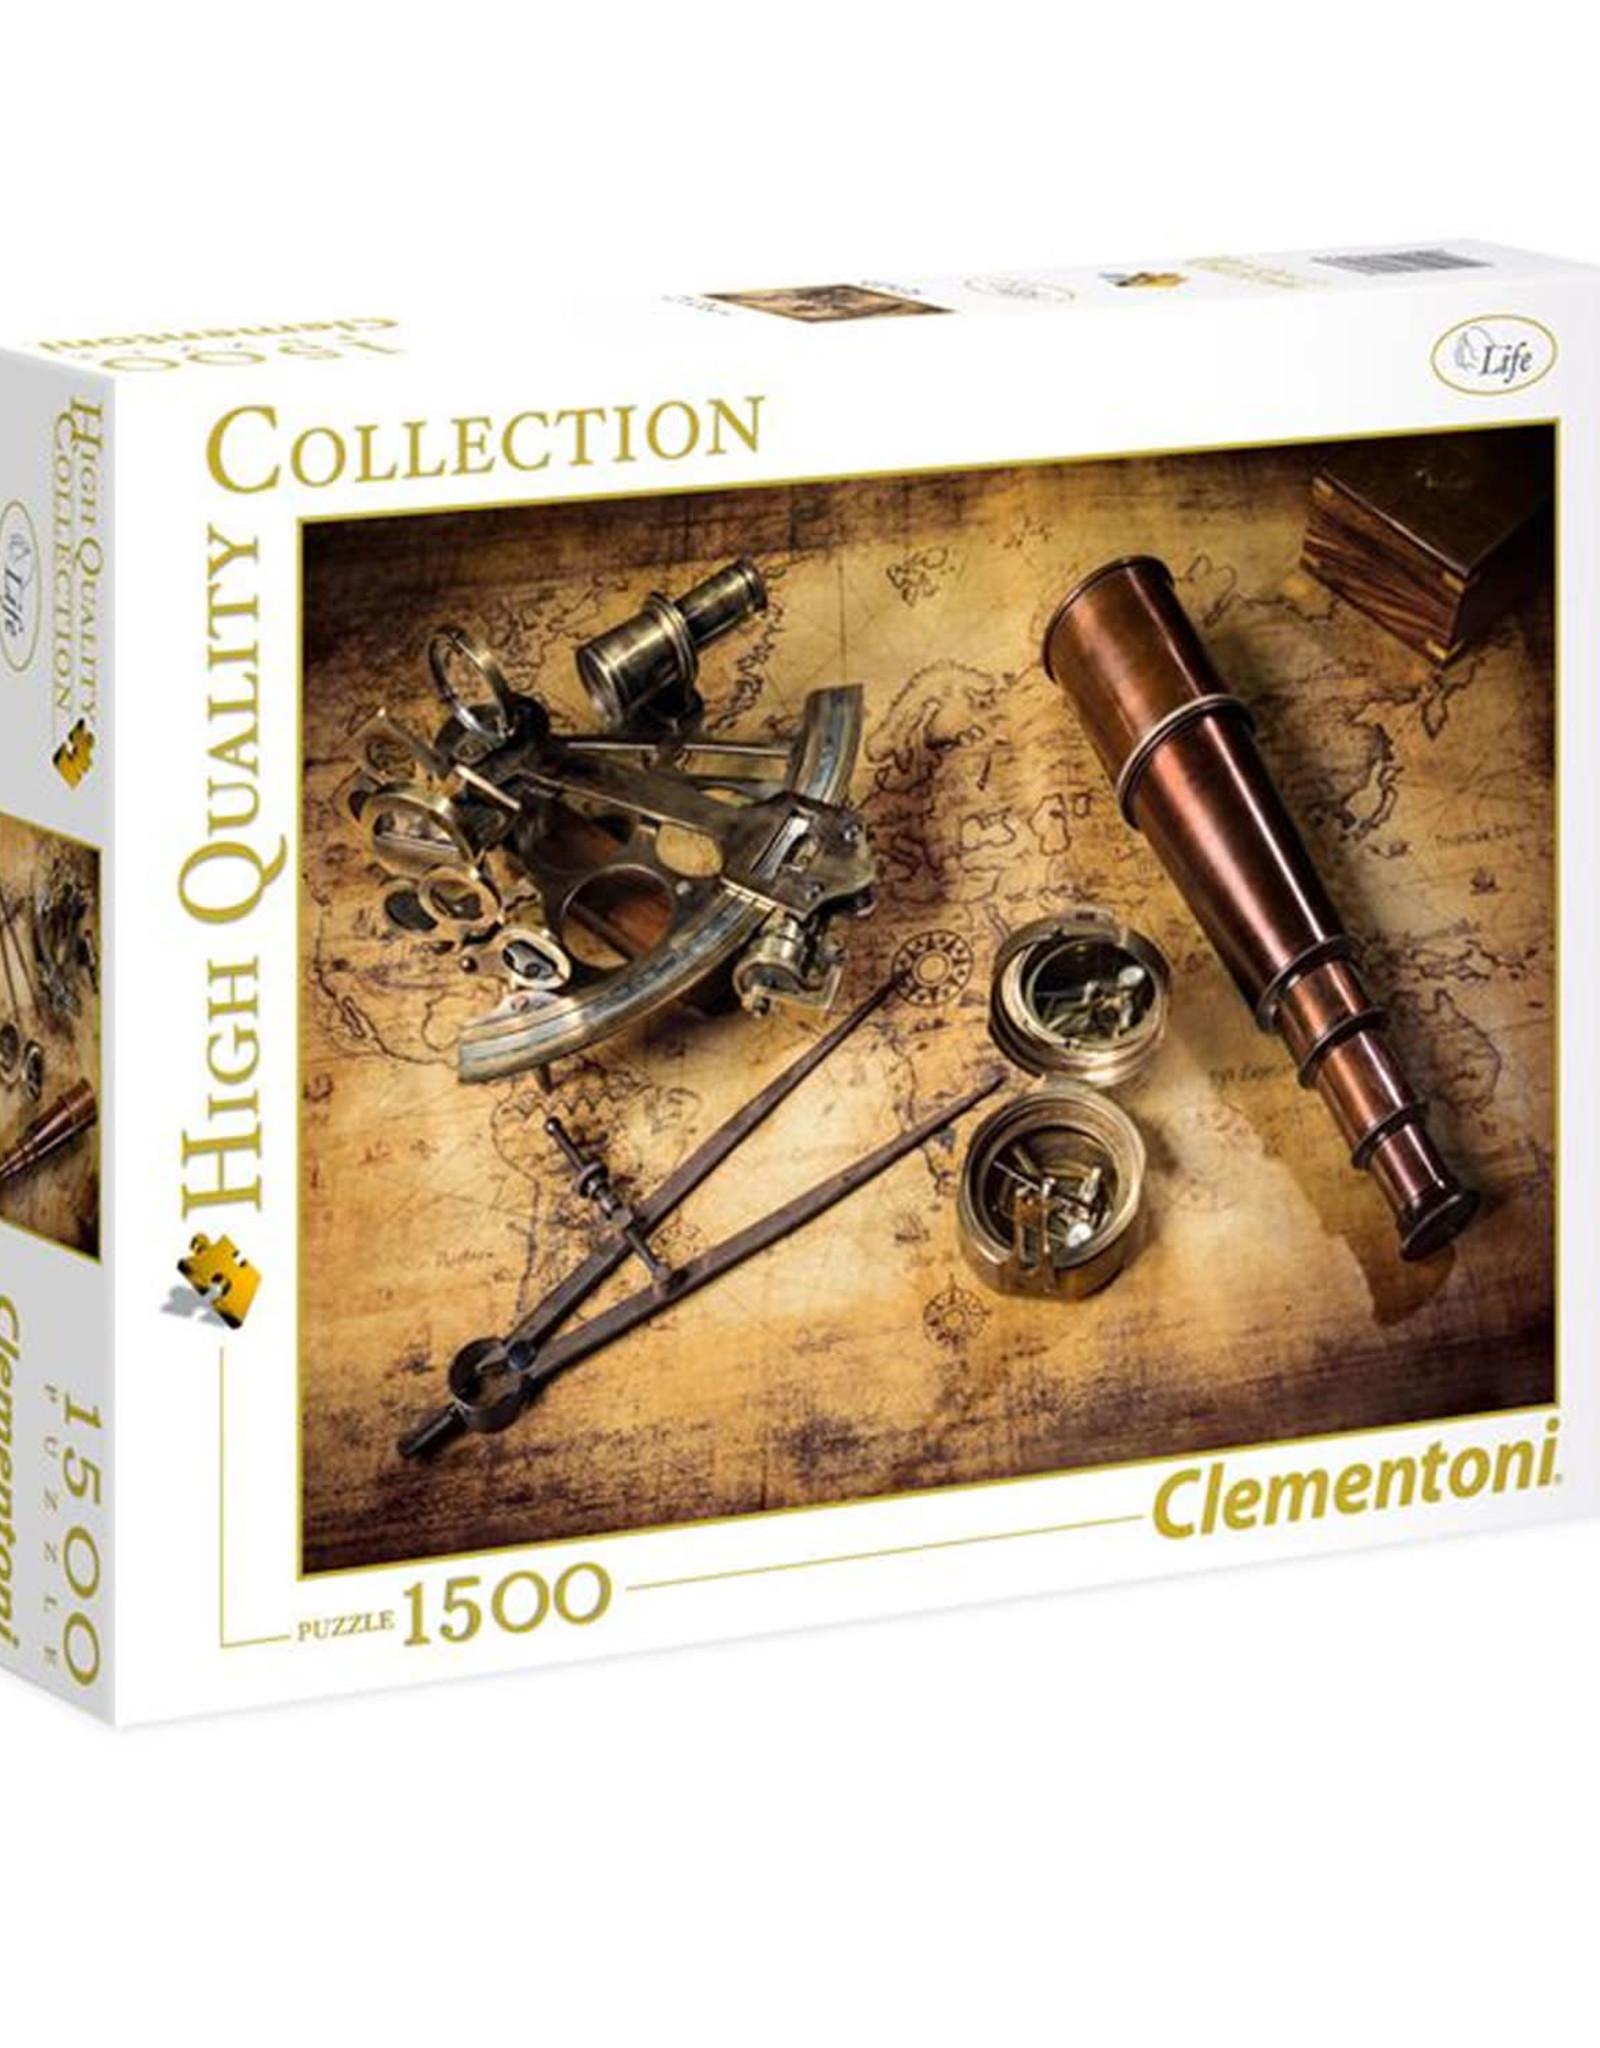 Clementoni 1500PC HQC -  COURSE TO THE TREASURE